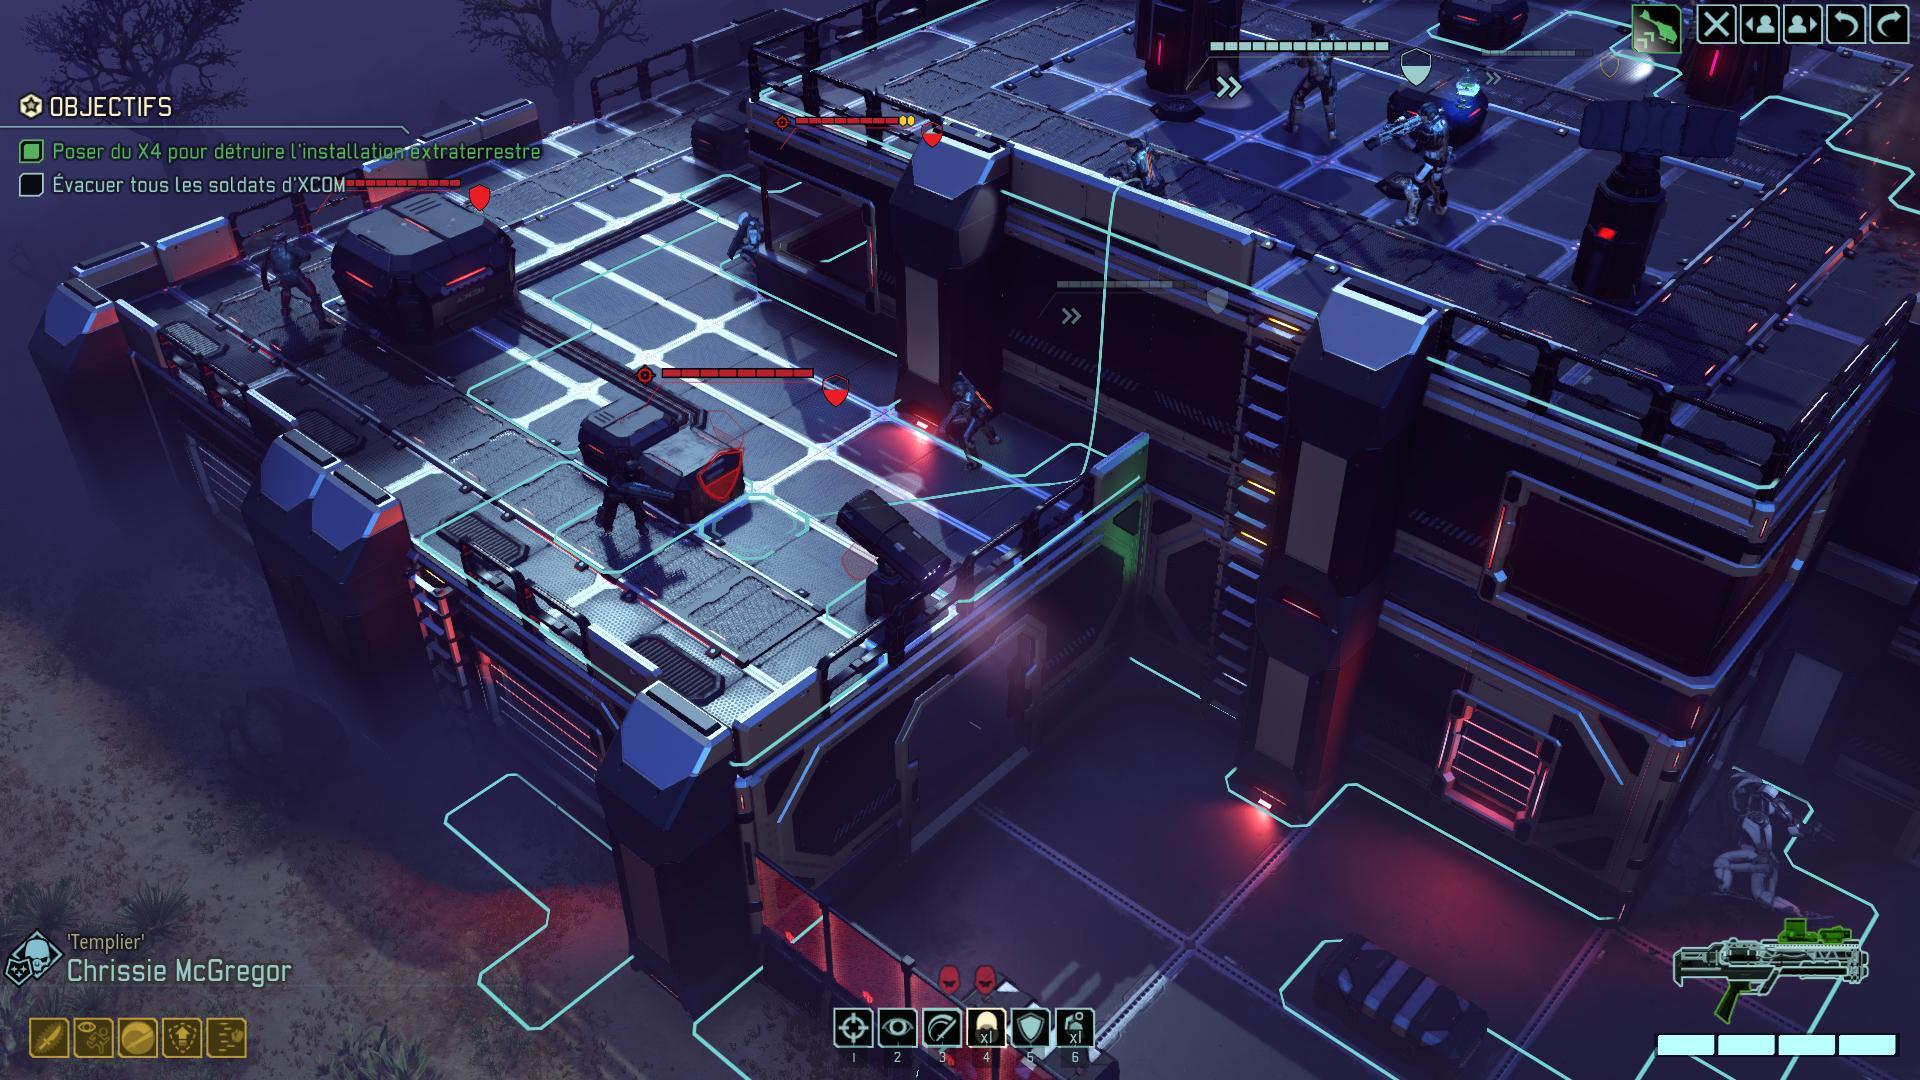 XCOM 2 Test